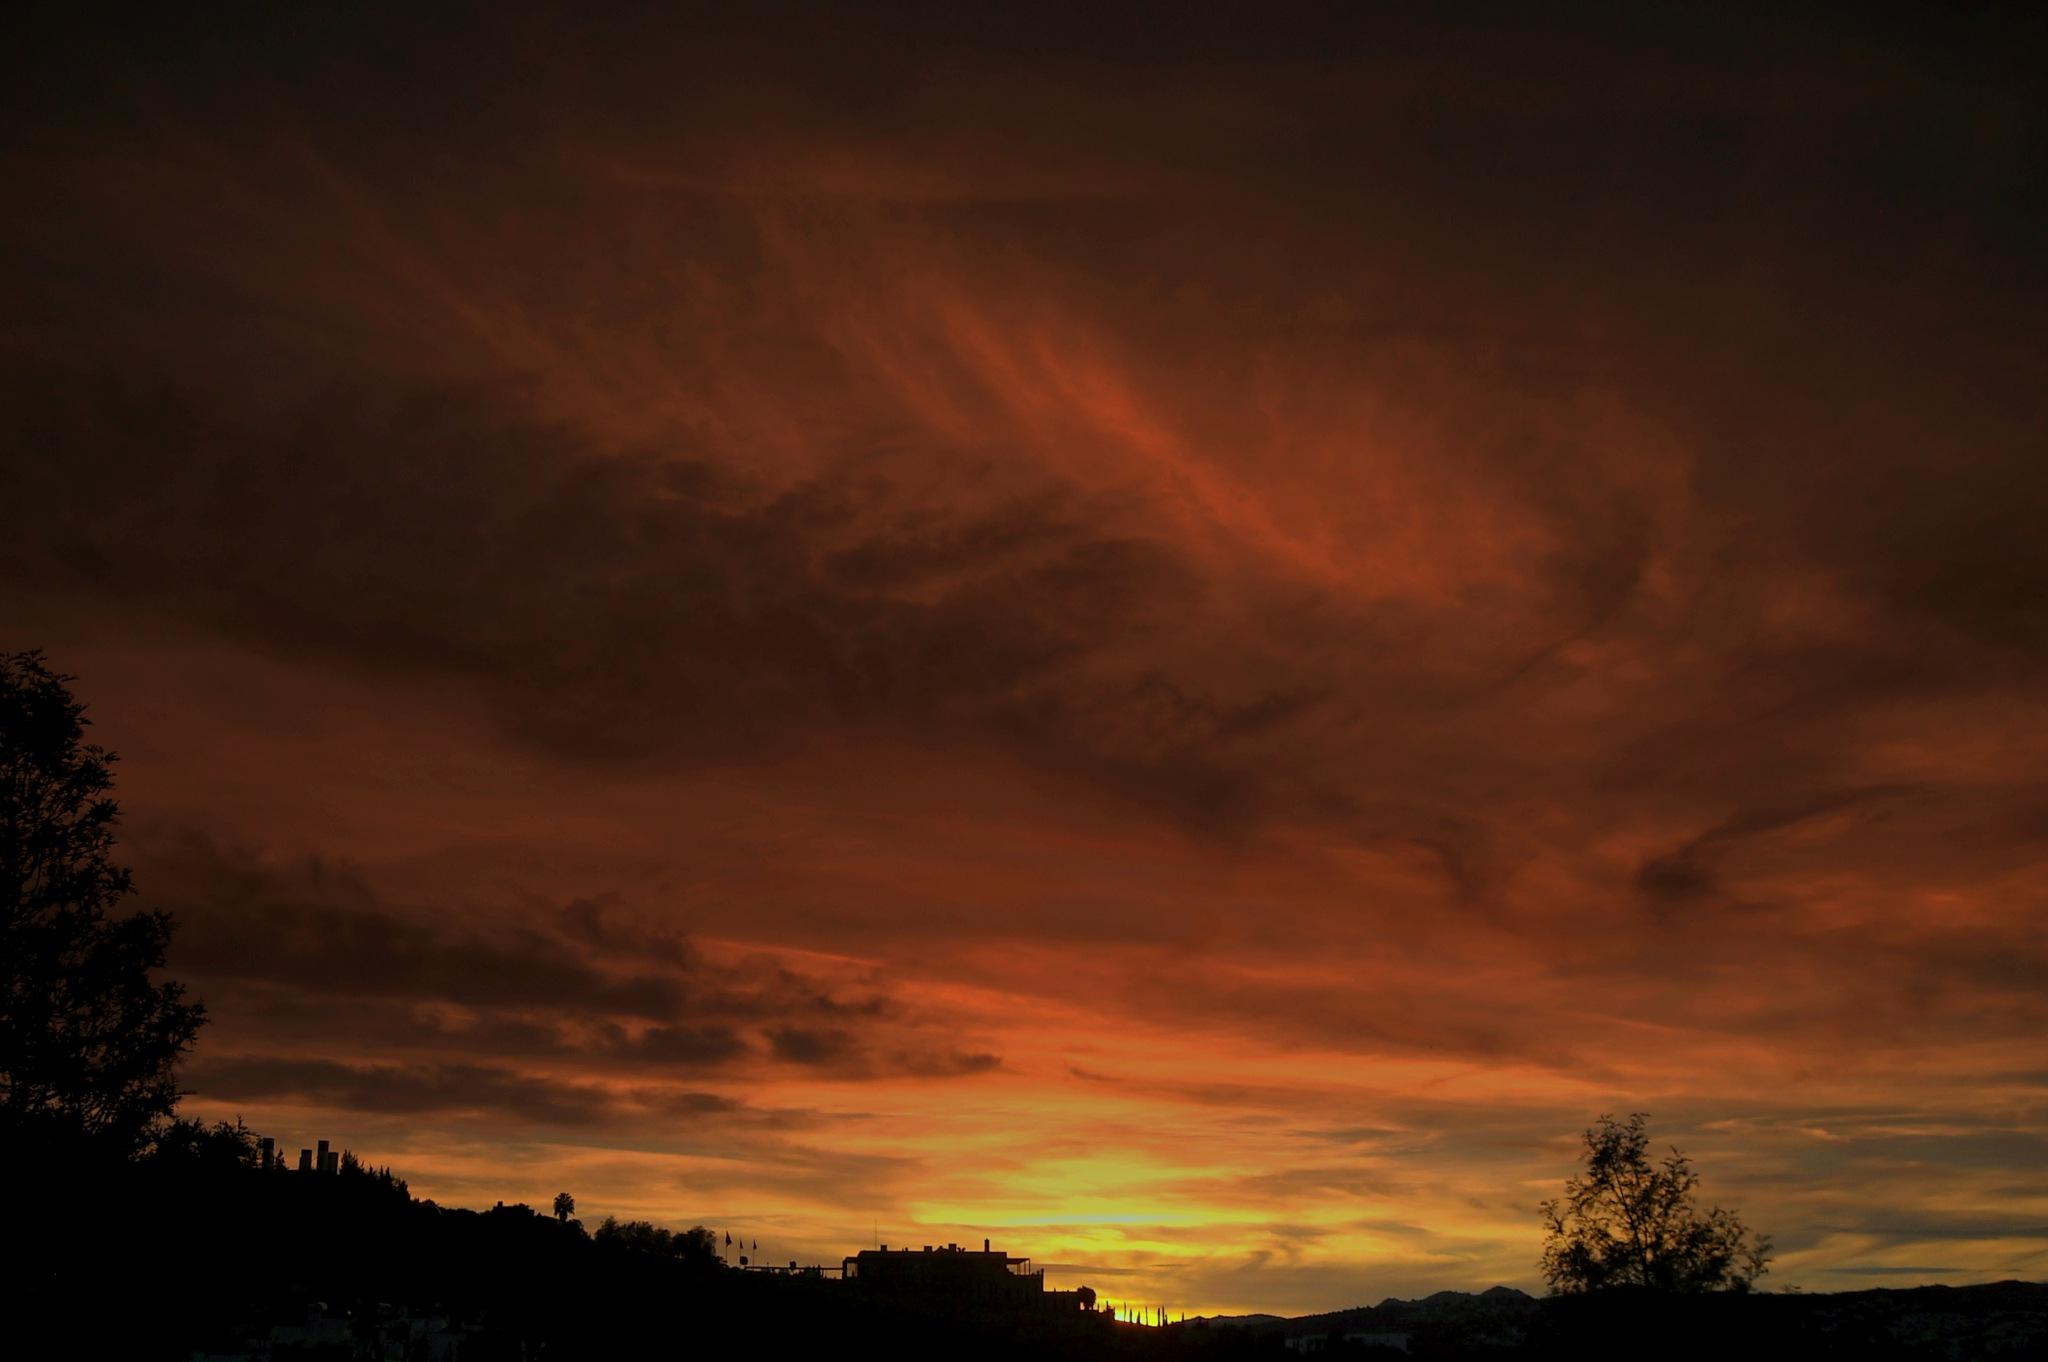 BEAUTIFUL SUNSETS OF BITEZ 12, FULL SCREEN by Akin Saner